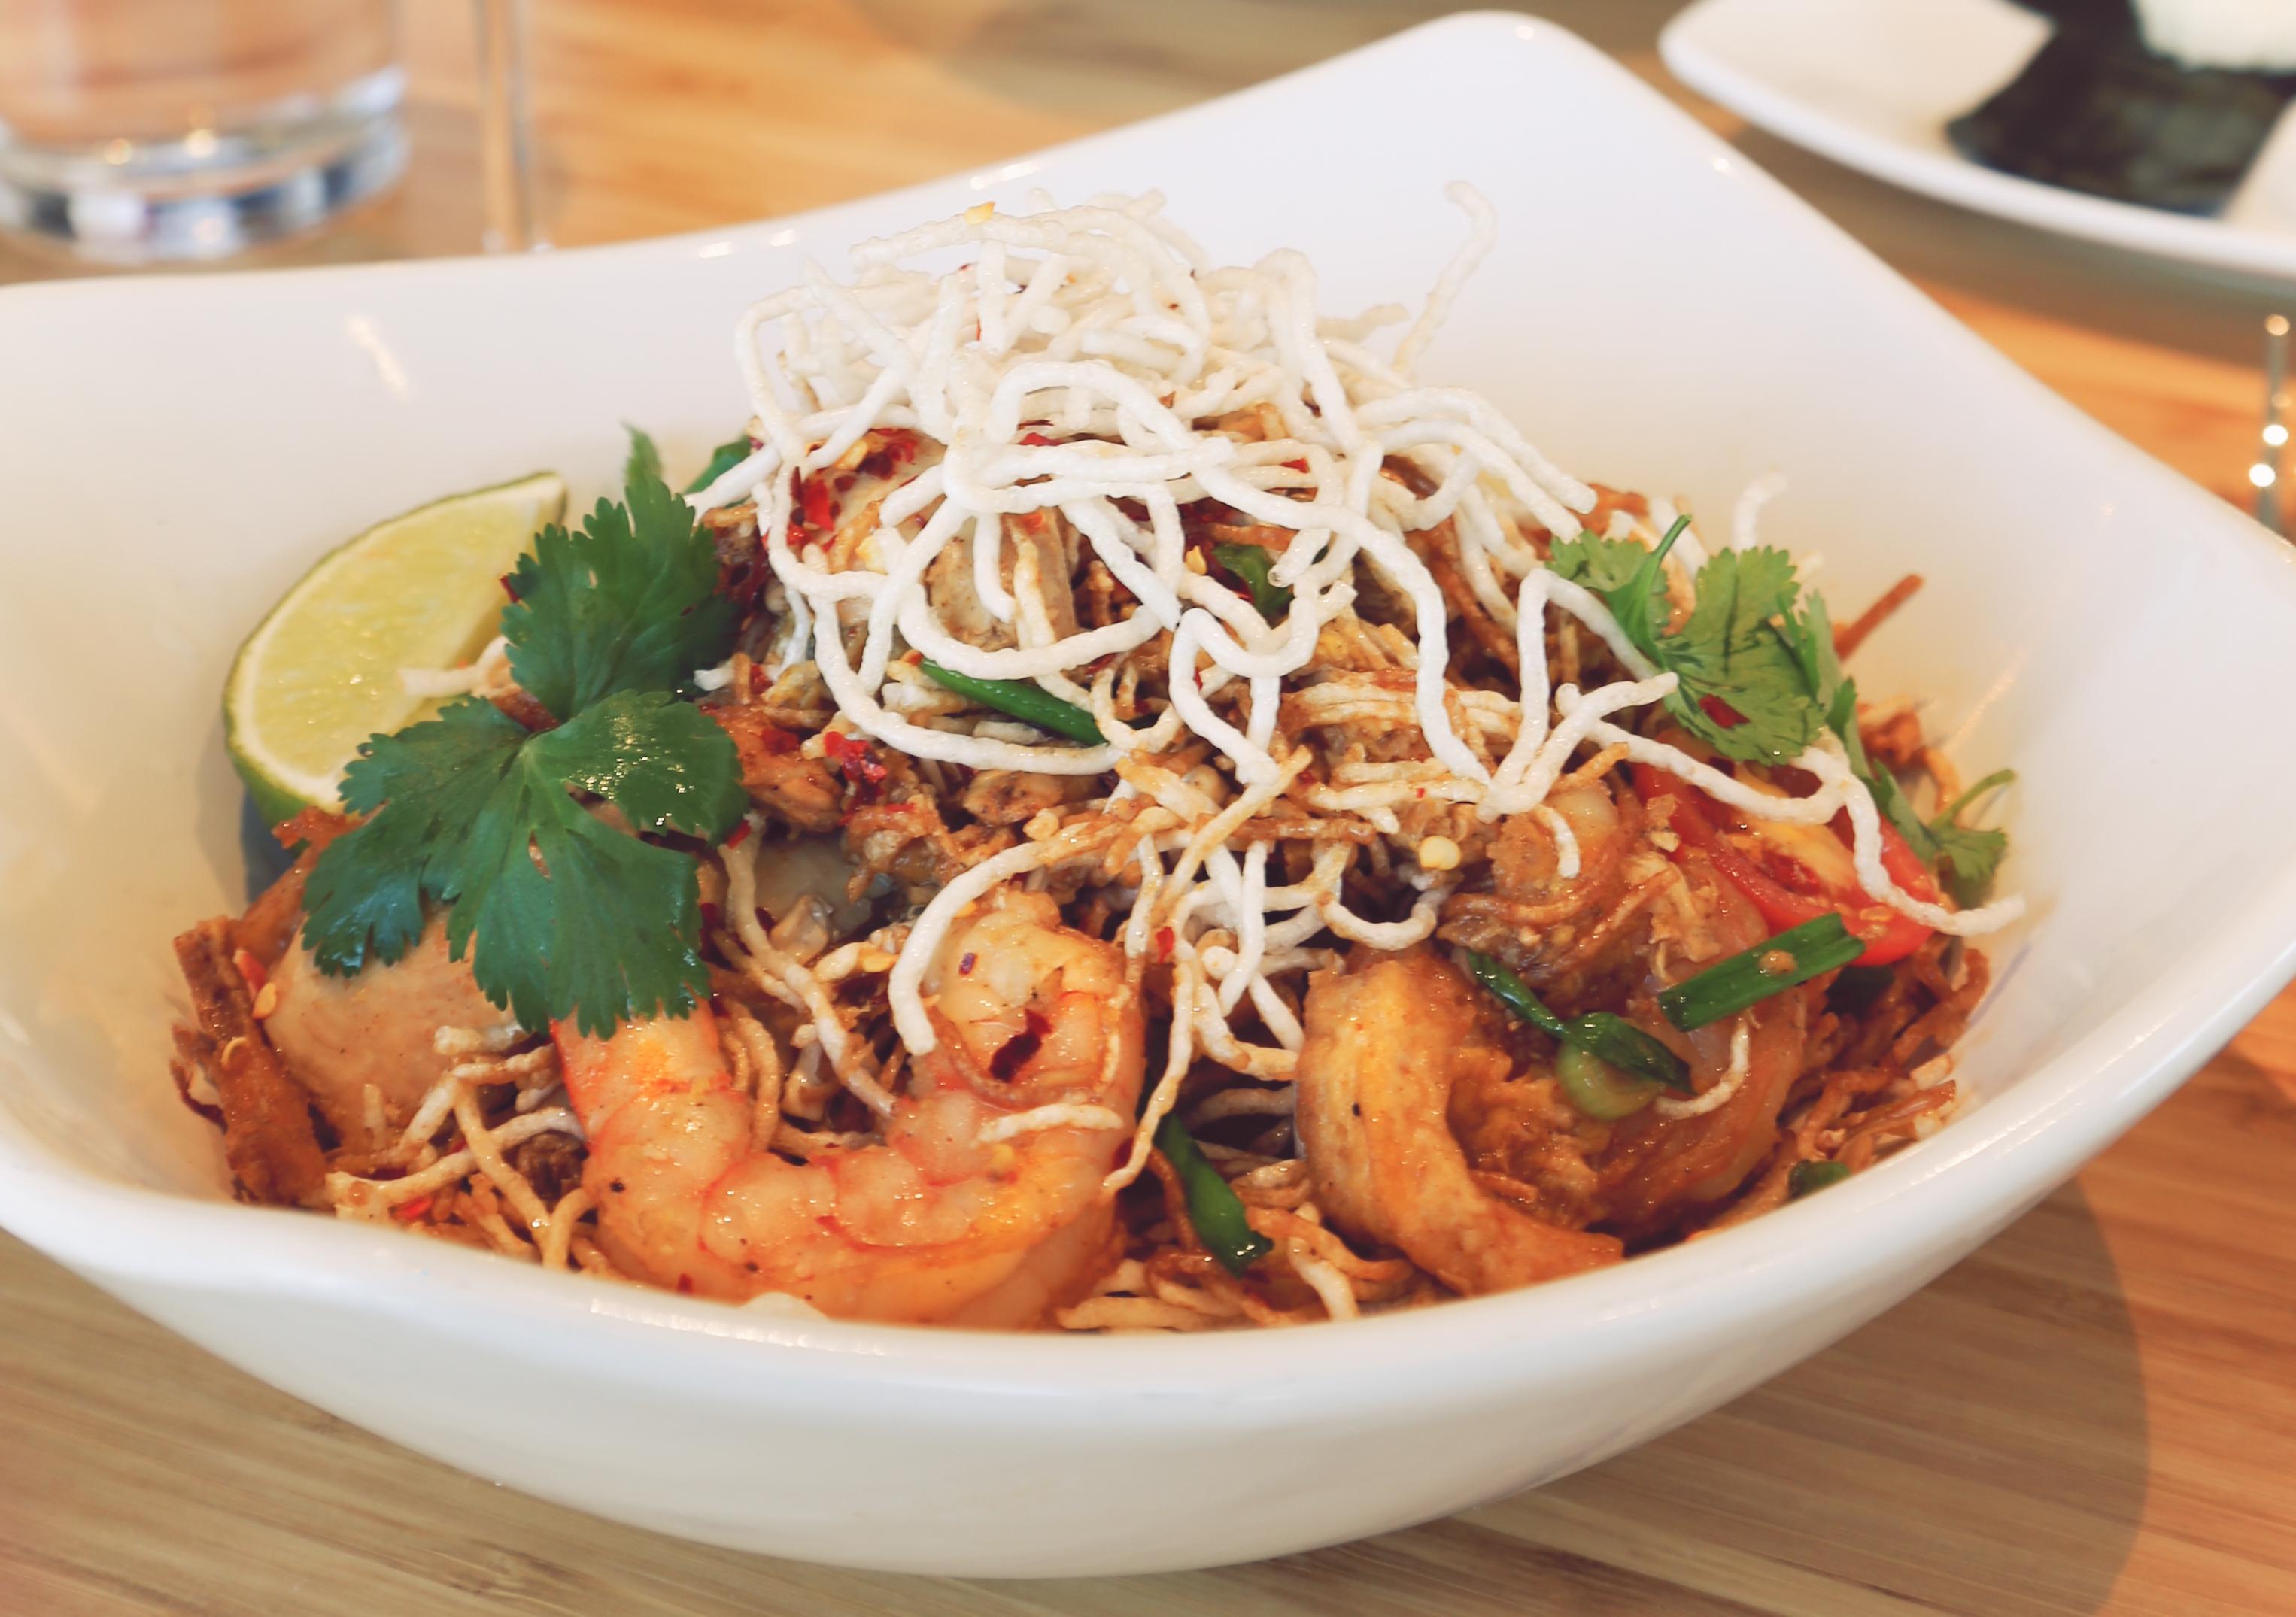 Tuesday - Sweet & Sour Crispy Noodles